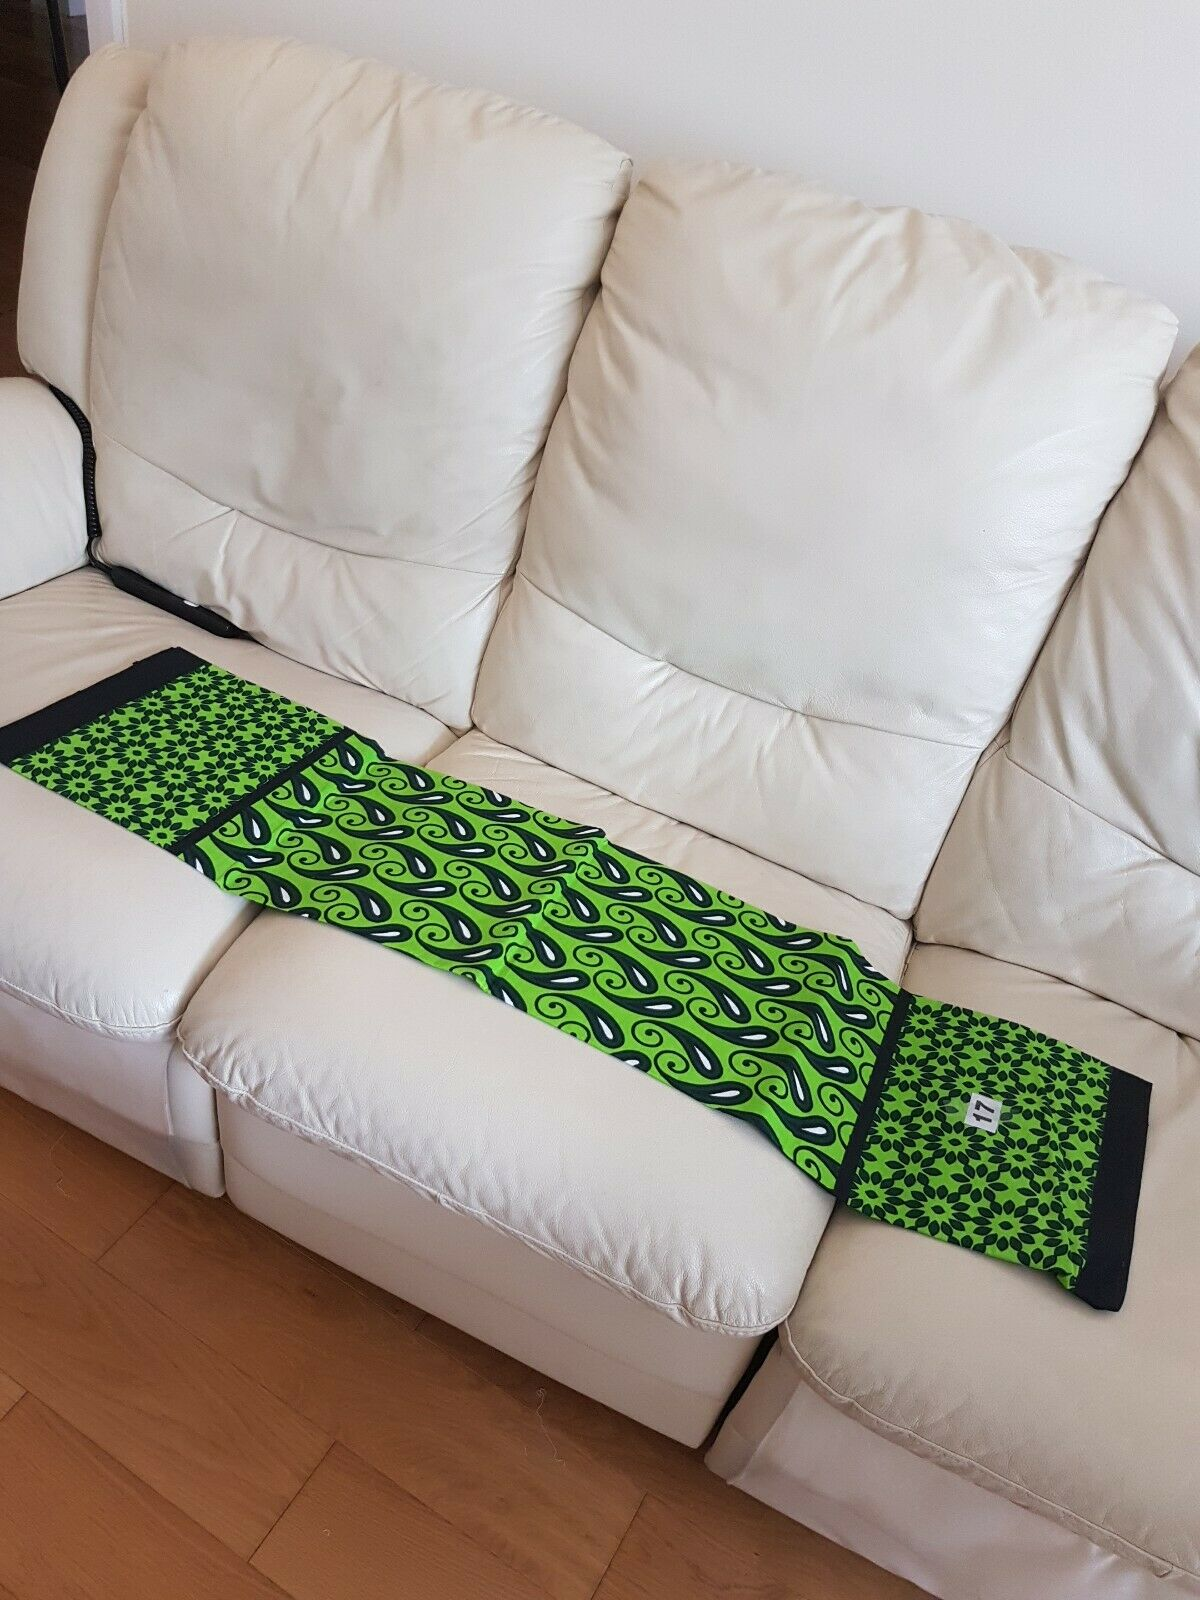 Kanga Khanga African Wrap African Fabric Pareo Kikoi Kikoy KENTON KIKOYS SARONG